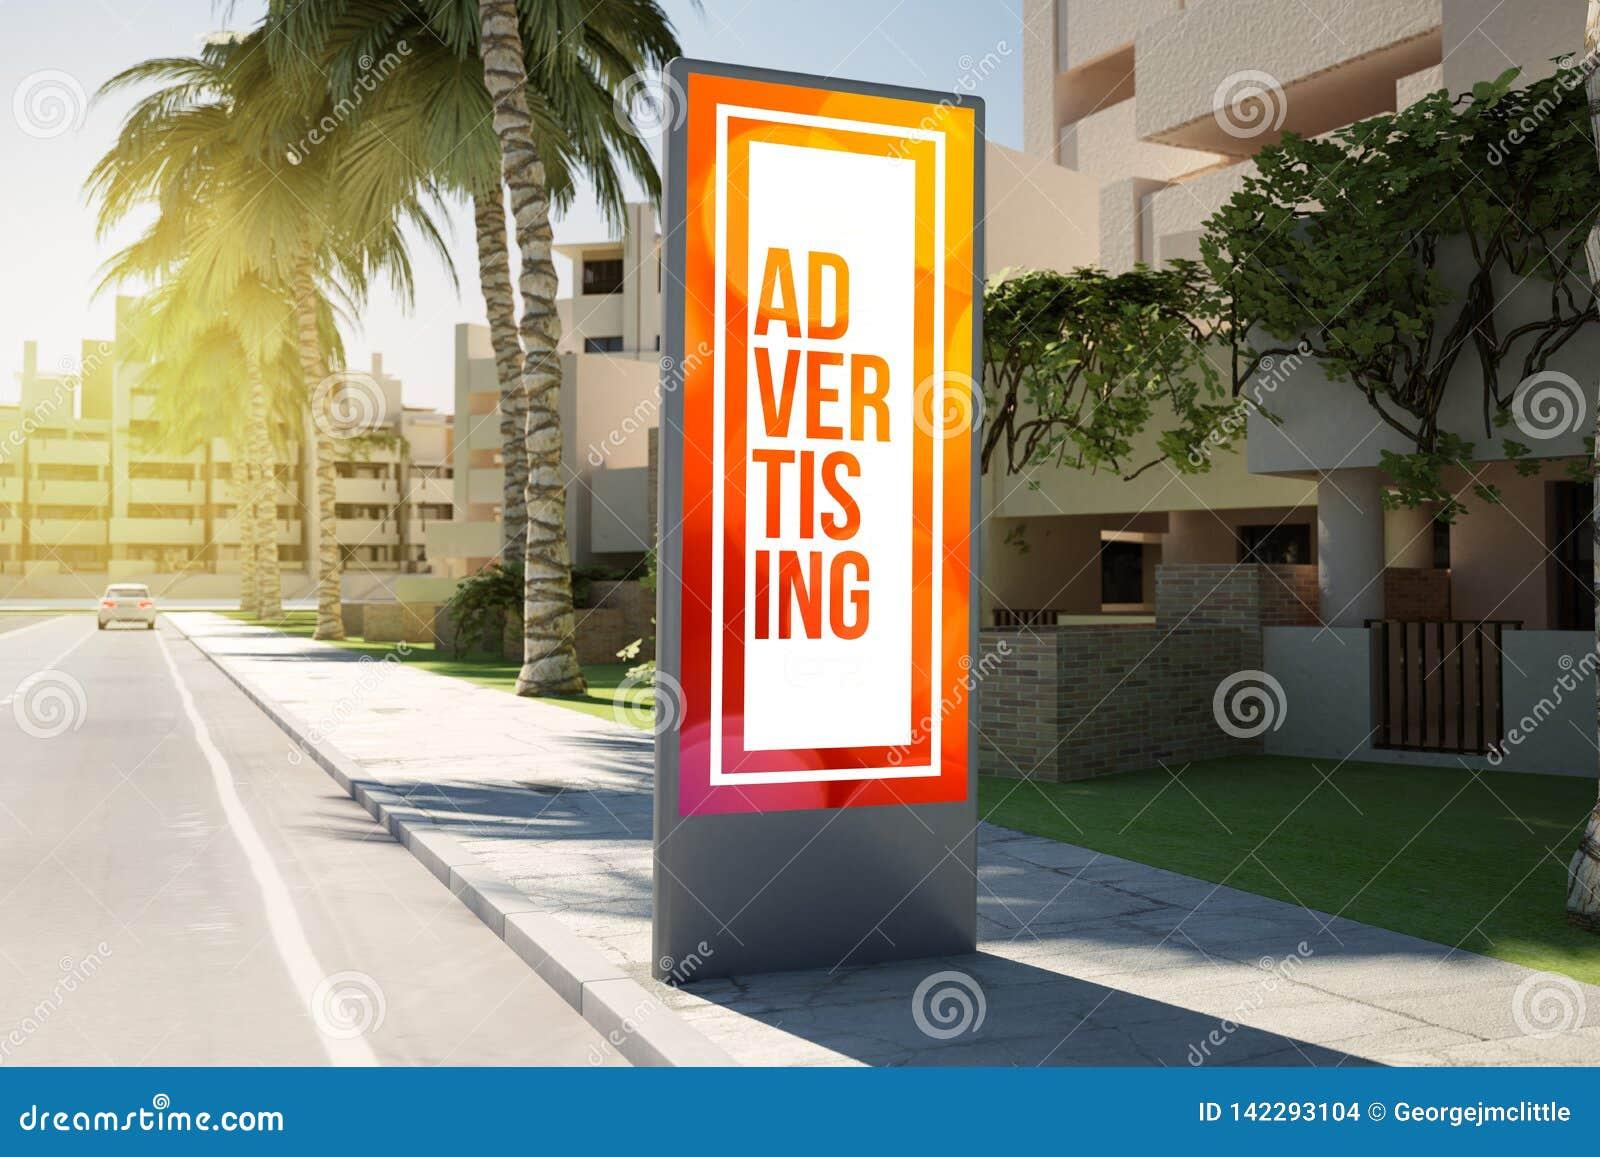 Vertikal affischtavlaadvertisingon gatan